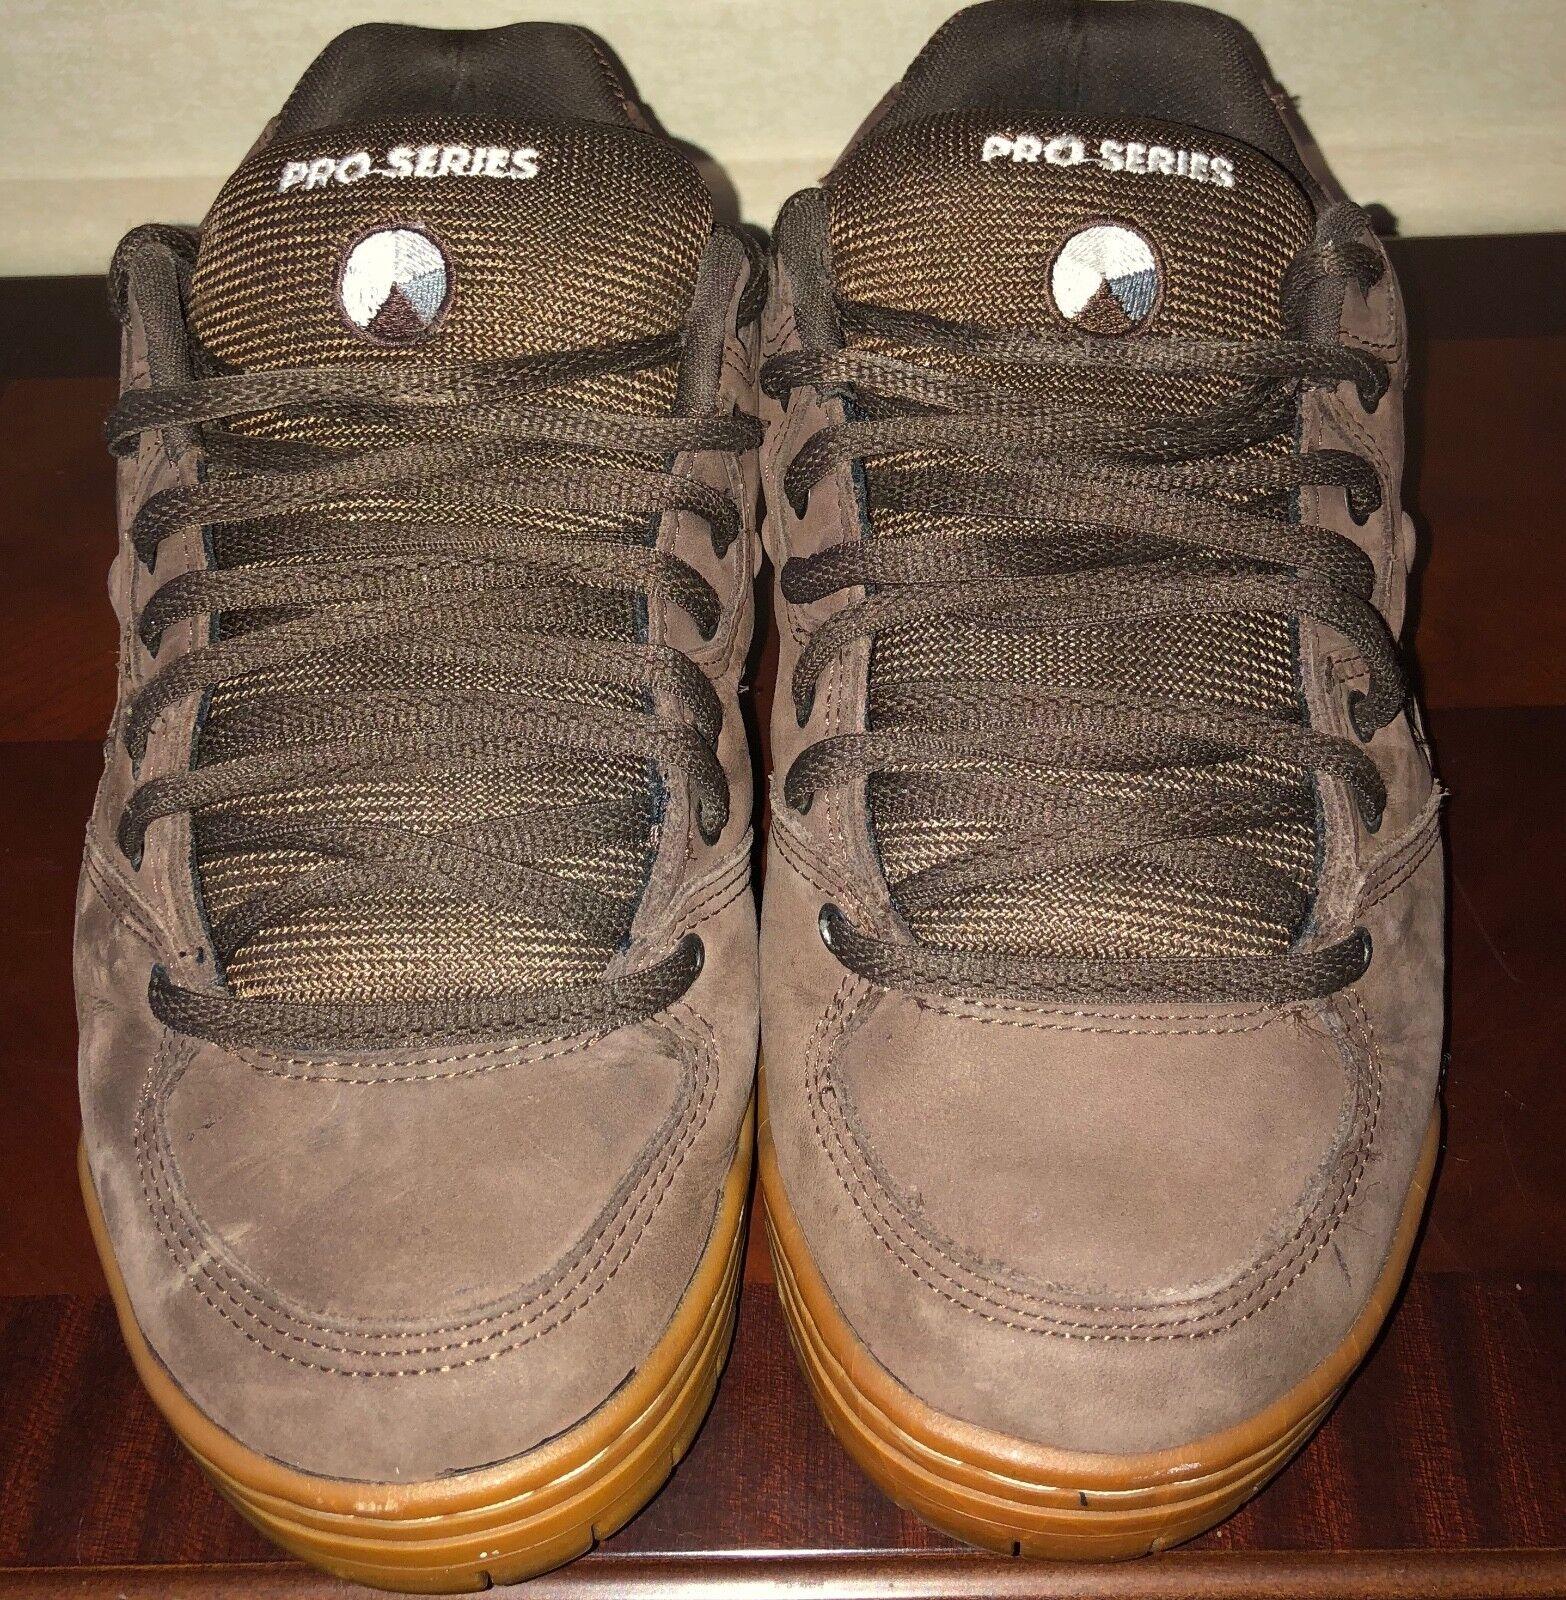 Men's Size 12 Authentic Vans Pro Series OG Wade Speyer The Mingus 1999 Sneakers